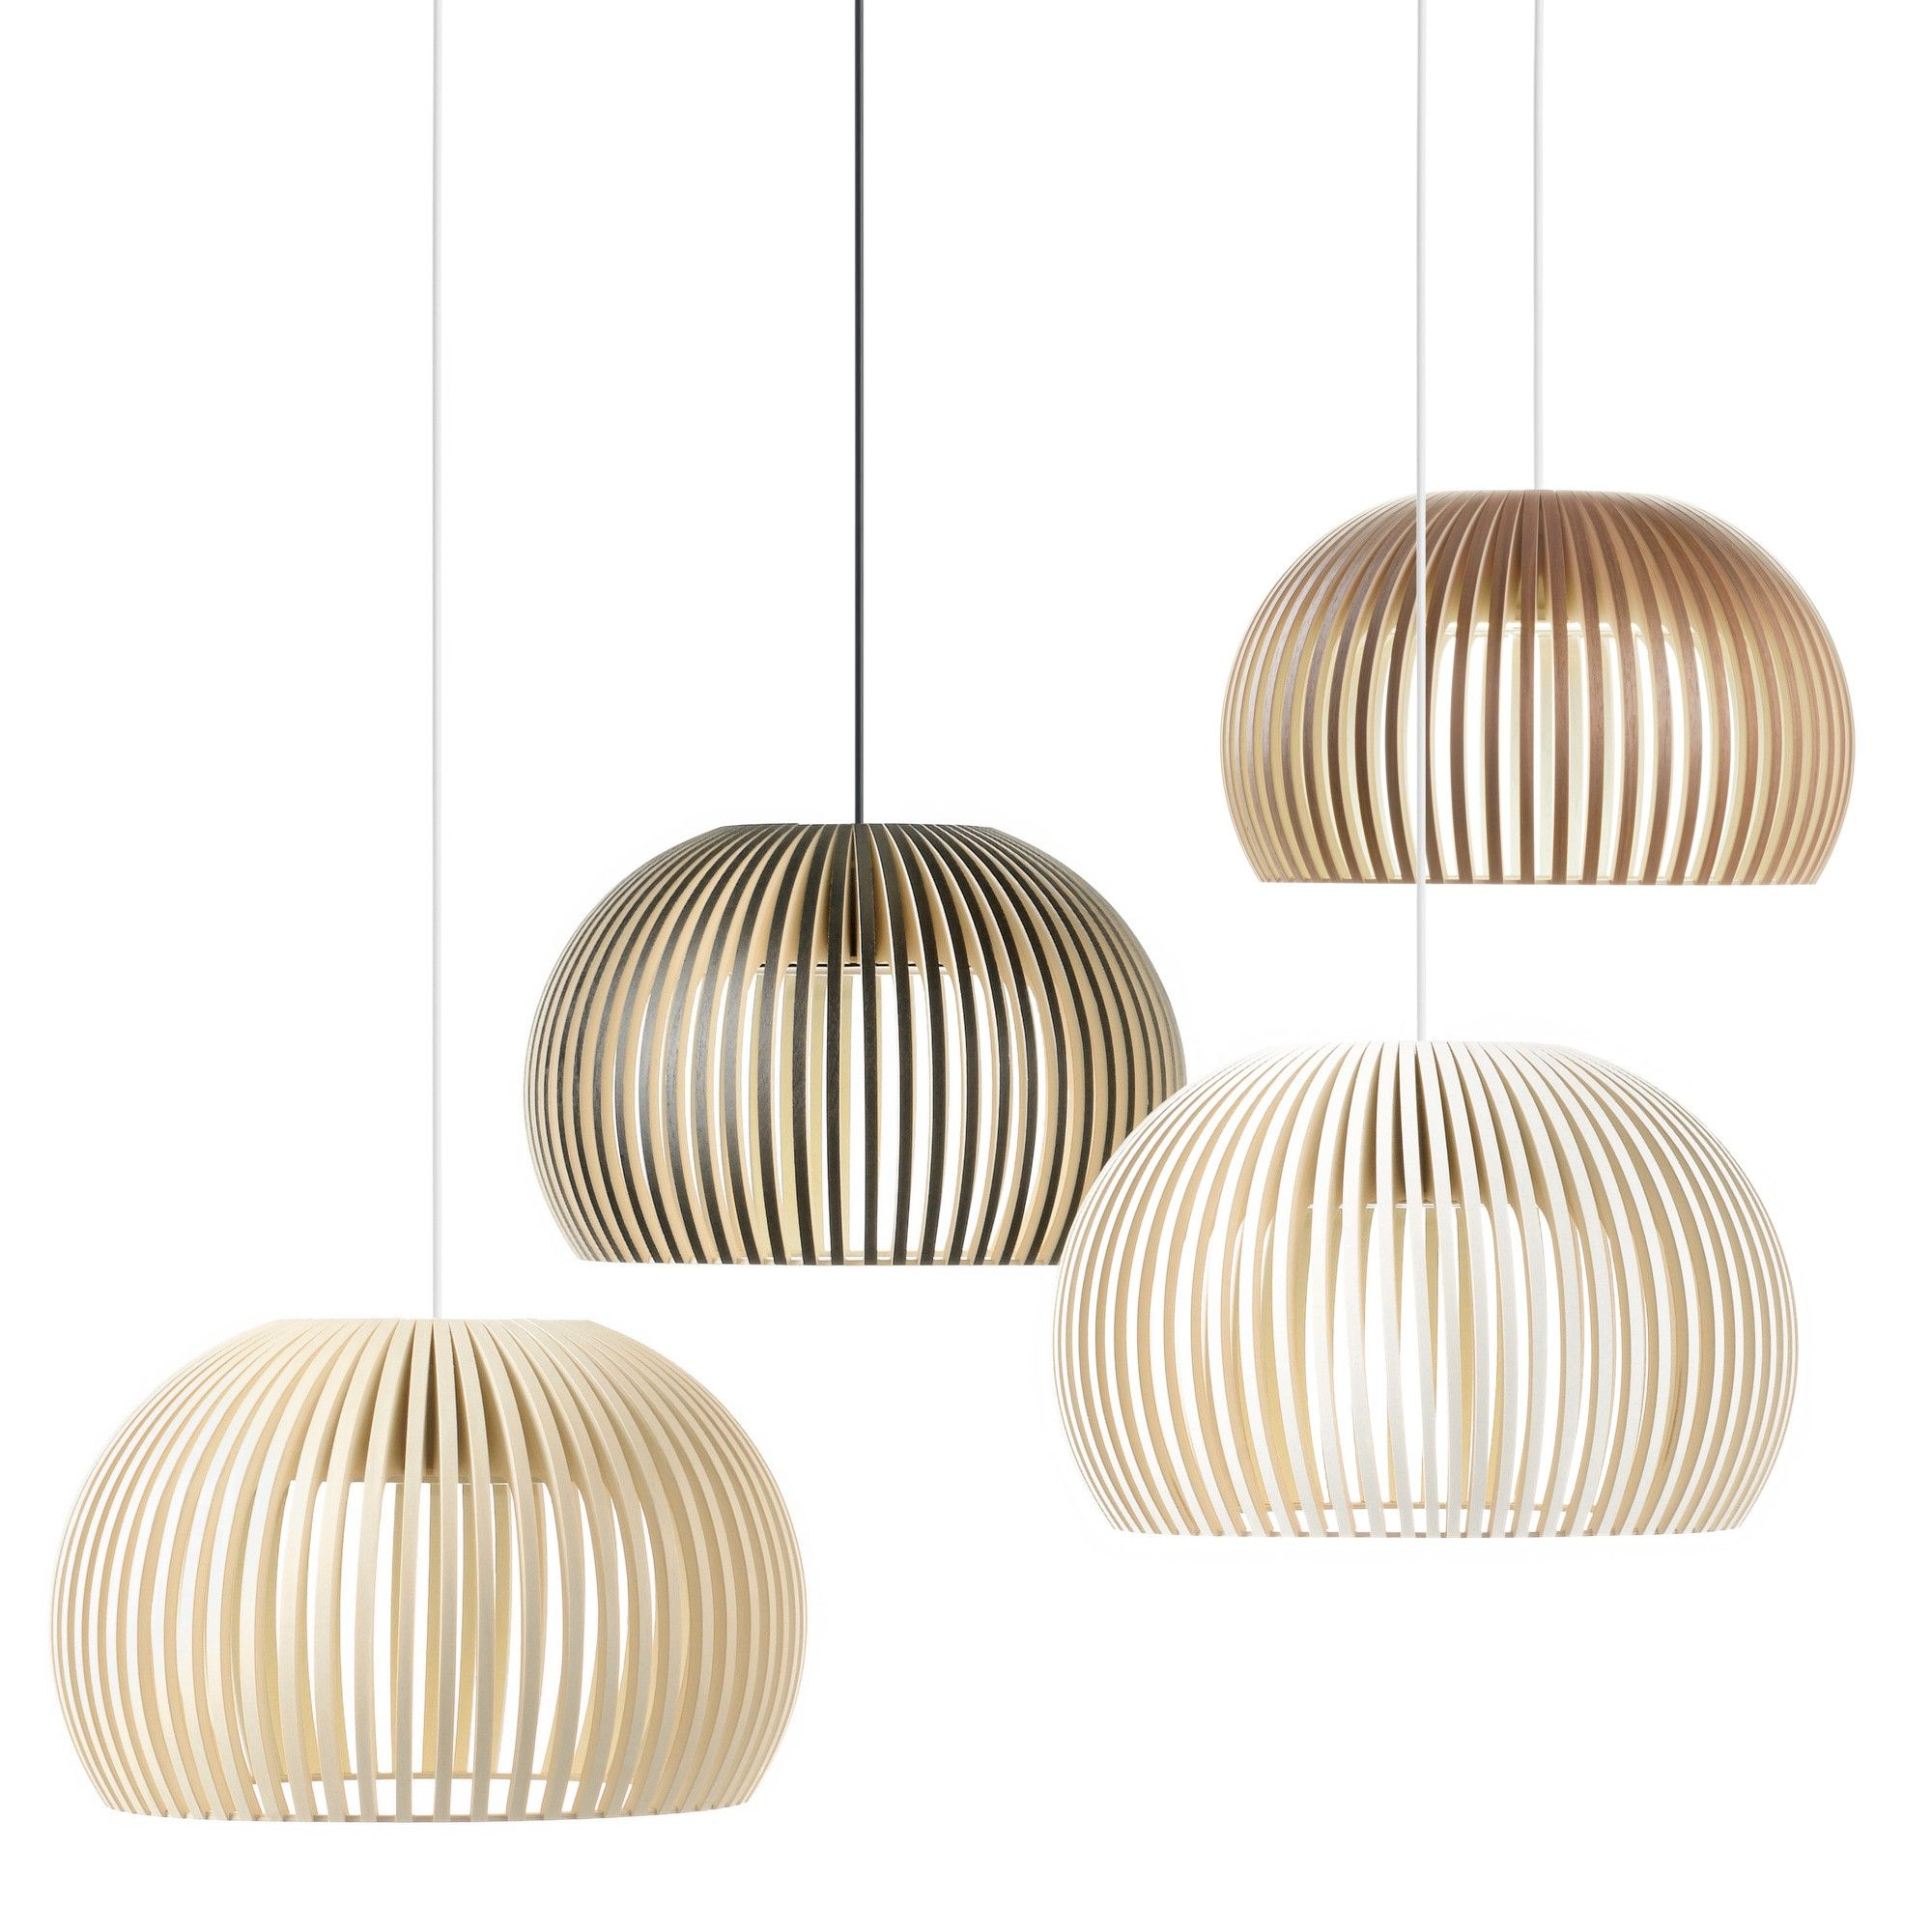 Atto 5000 pendant lamp Lamps lighting Pinterest